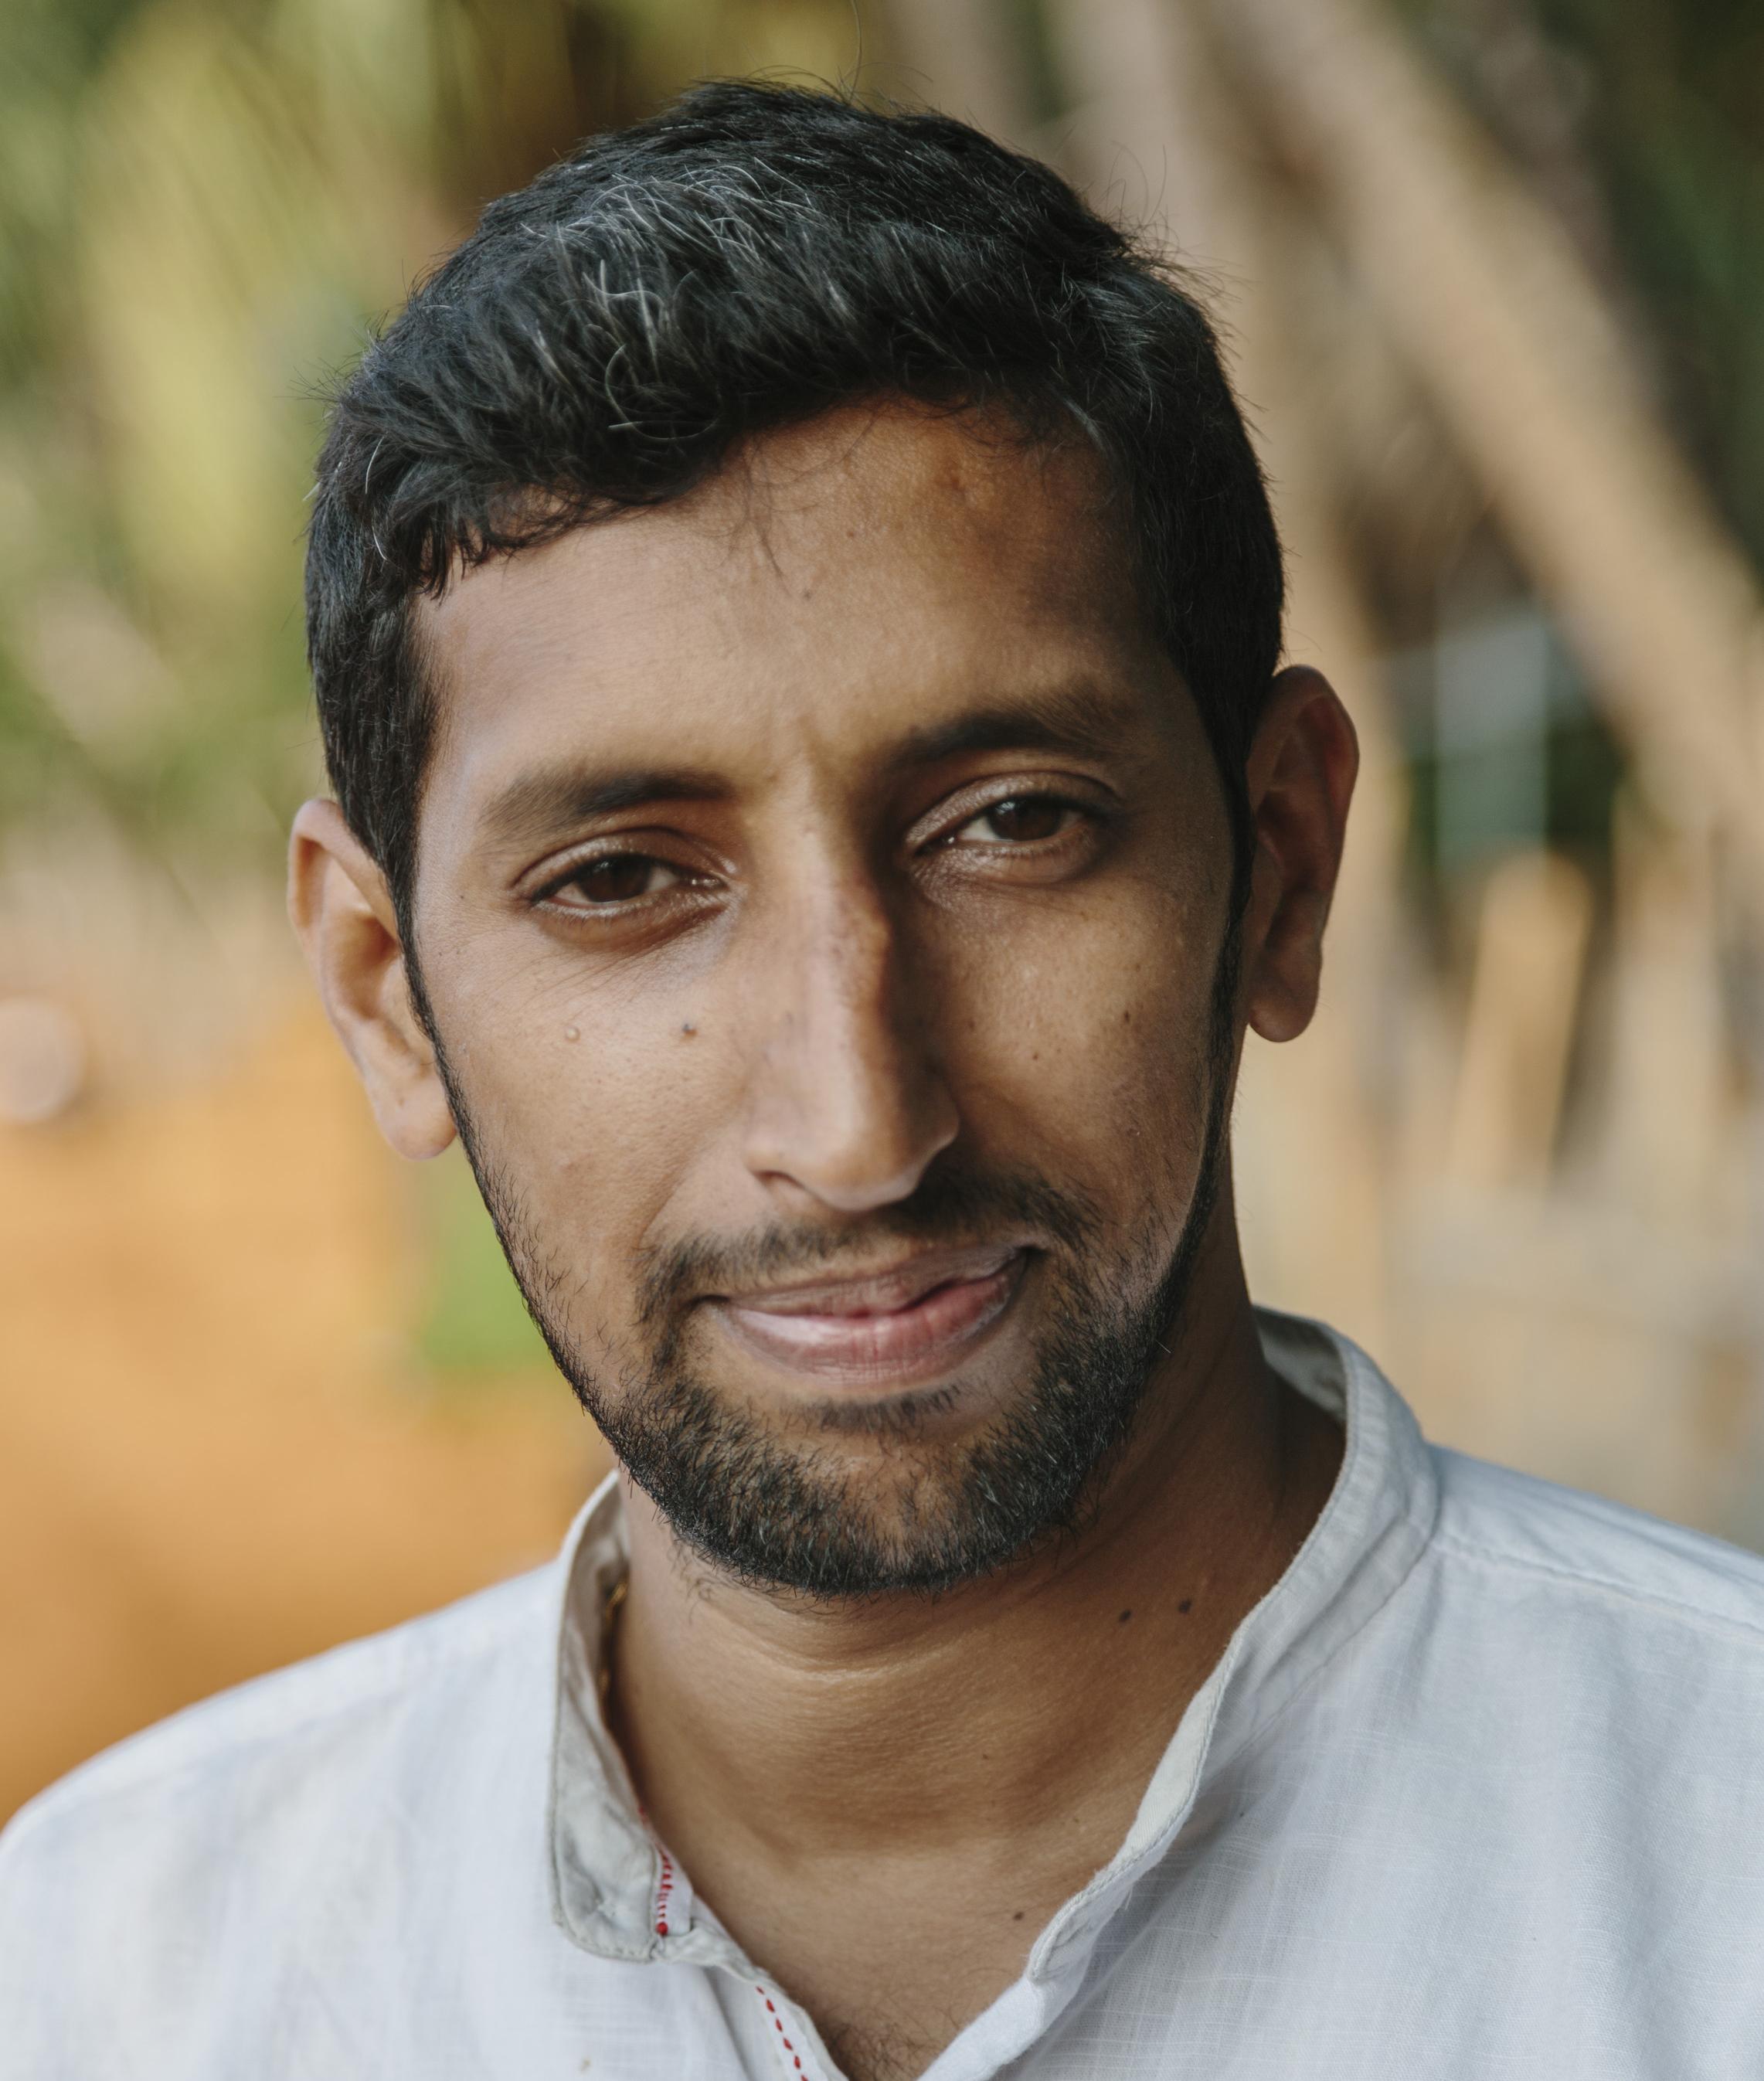 Mahabaleshwar Hegde